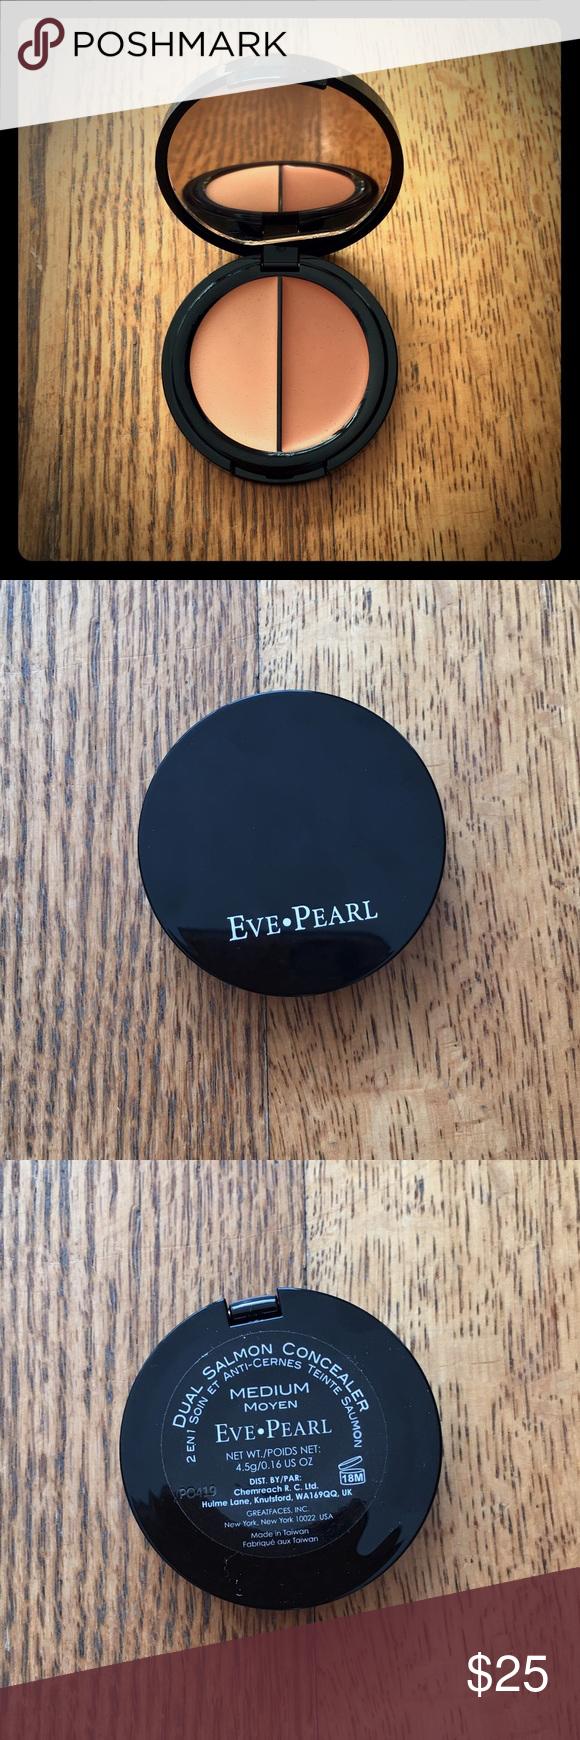 Eve Pearl Dual Salmon Concealer Brand new full size dual salmon concealer in medium. Eve Pearl Makeup Concealer